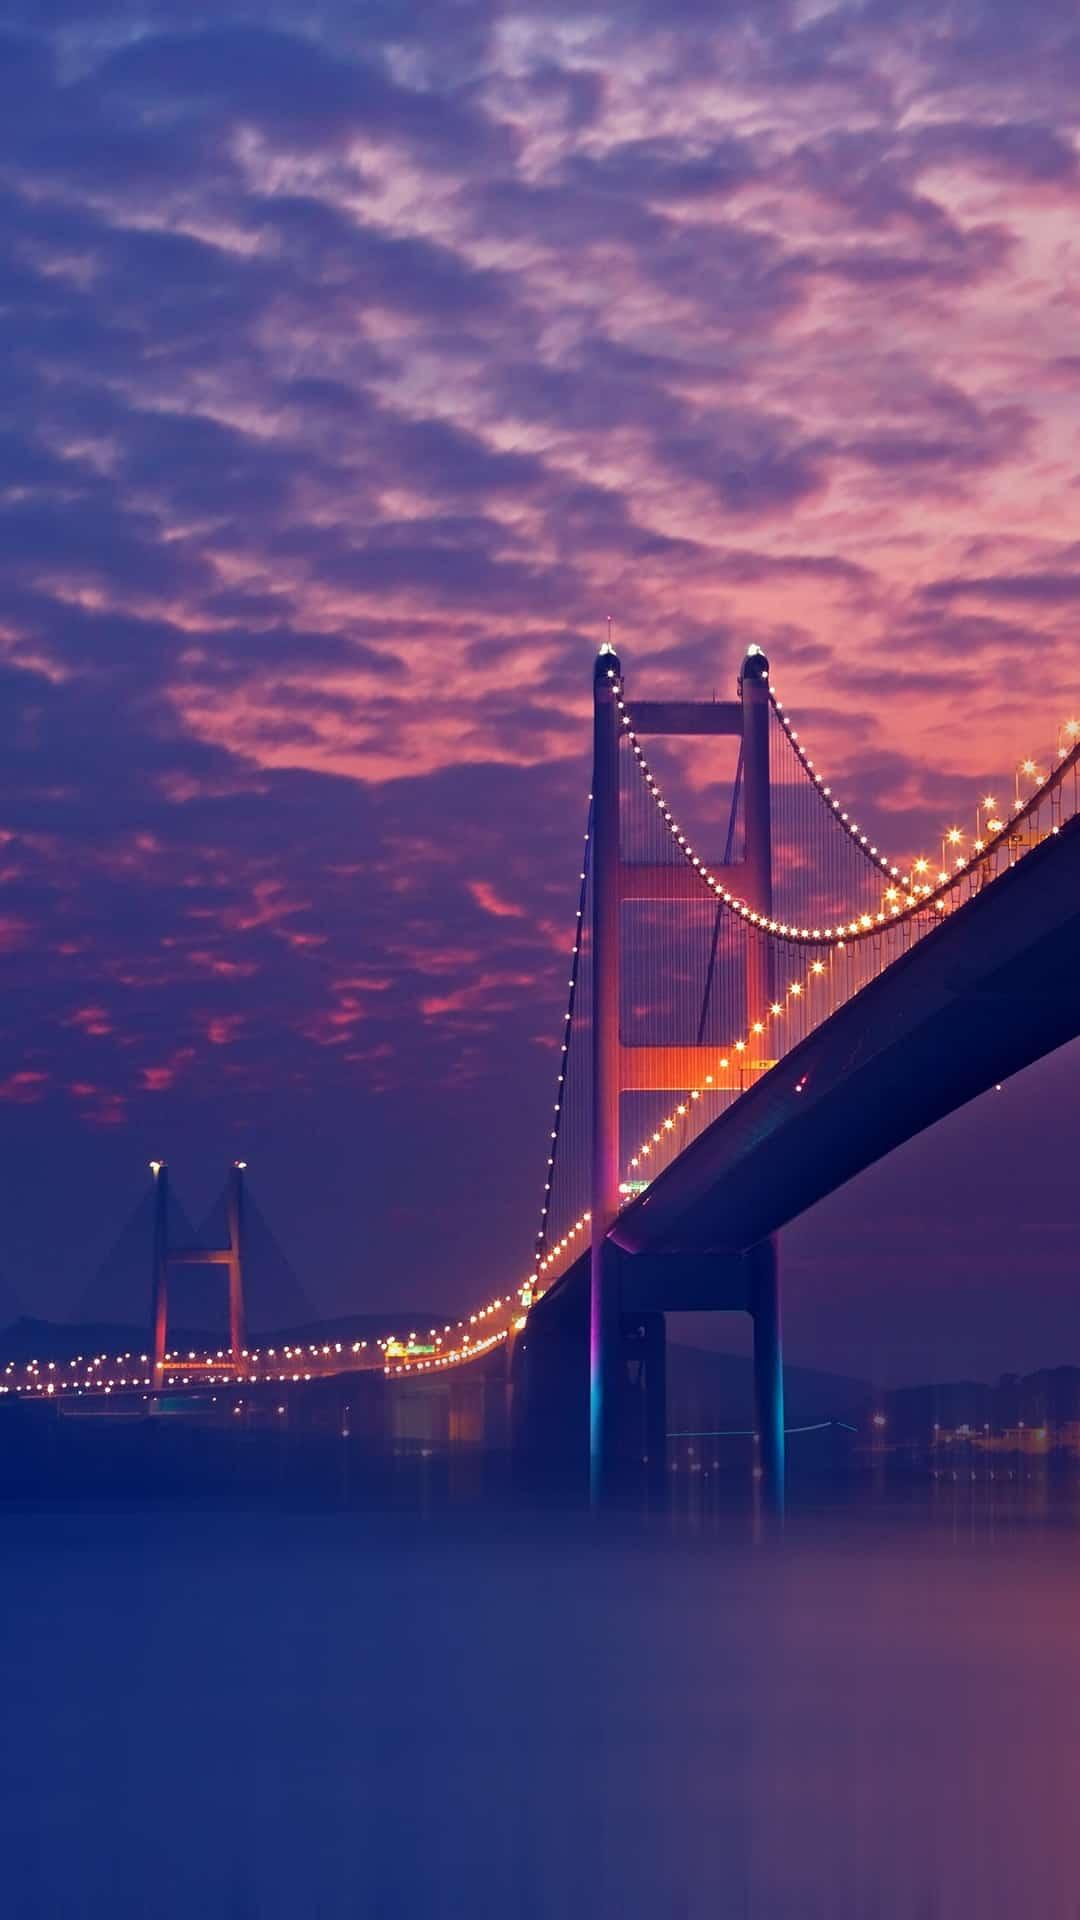 Bridge Night Lights Purple Andro Iphone Wallpaper Bridge